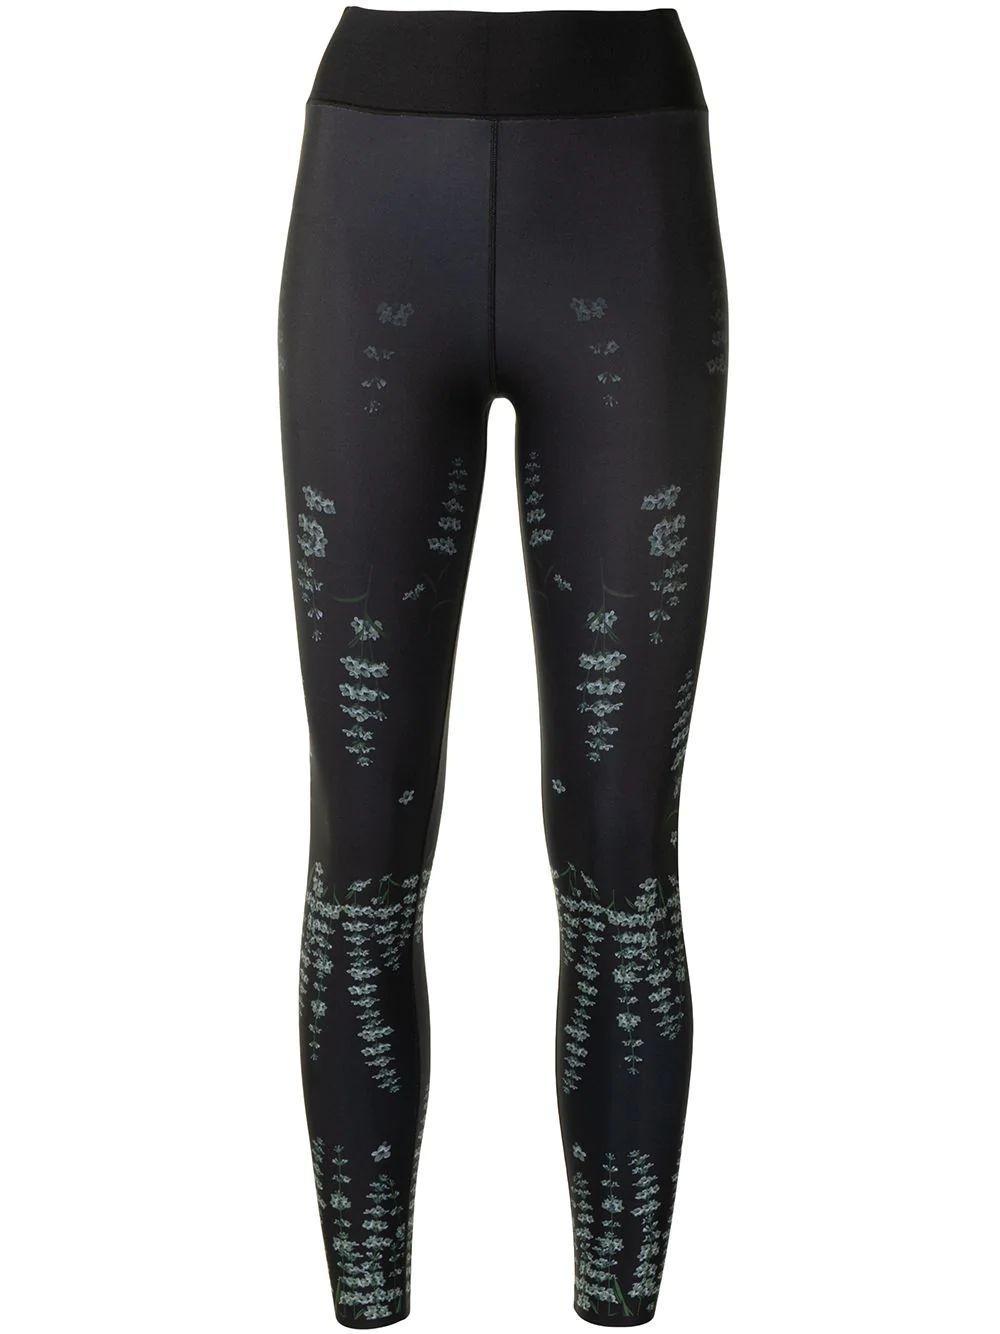 Hyacinth Ultra Legging Item # A520MU302SLKB-H